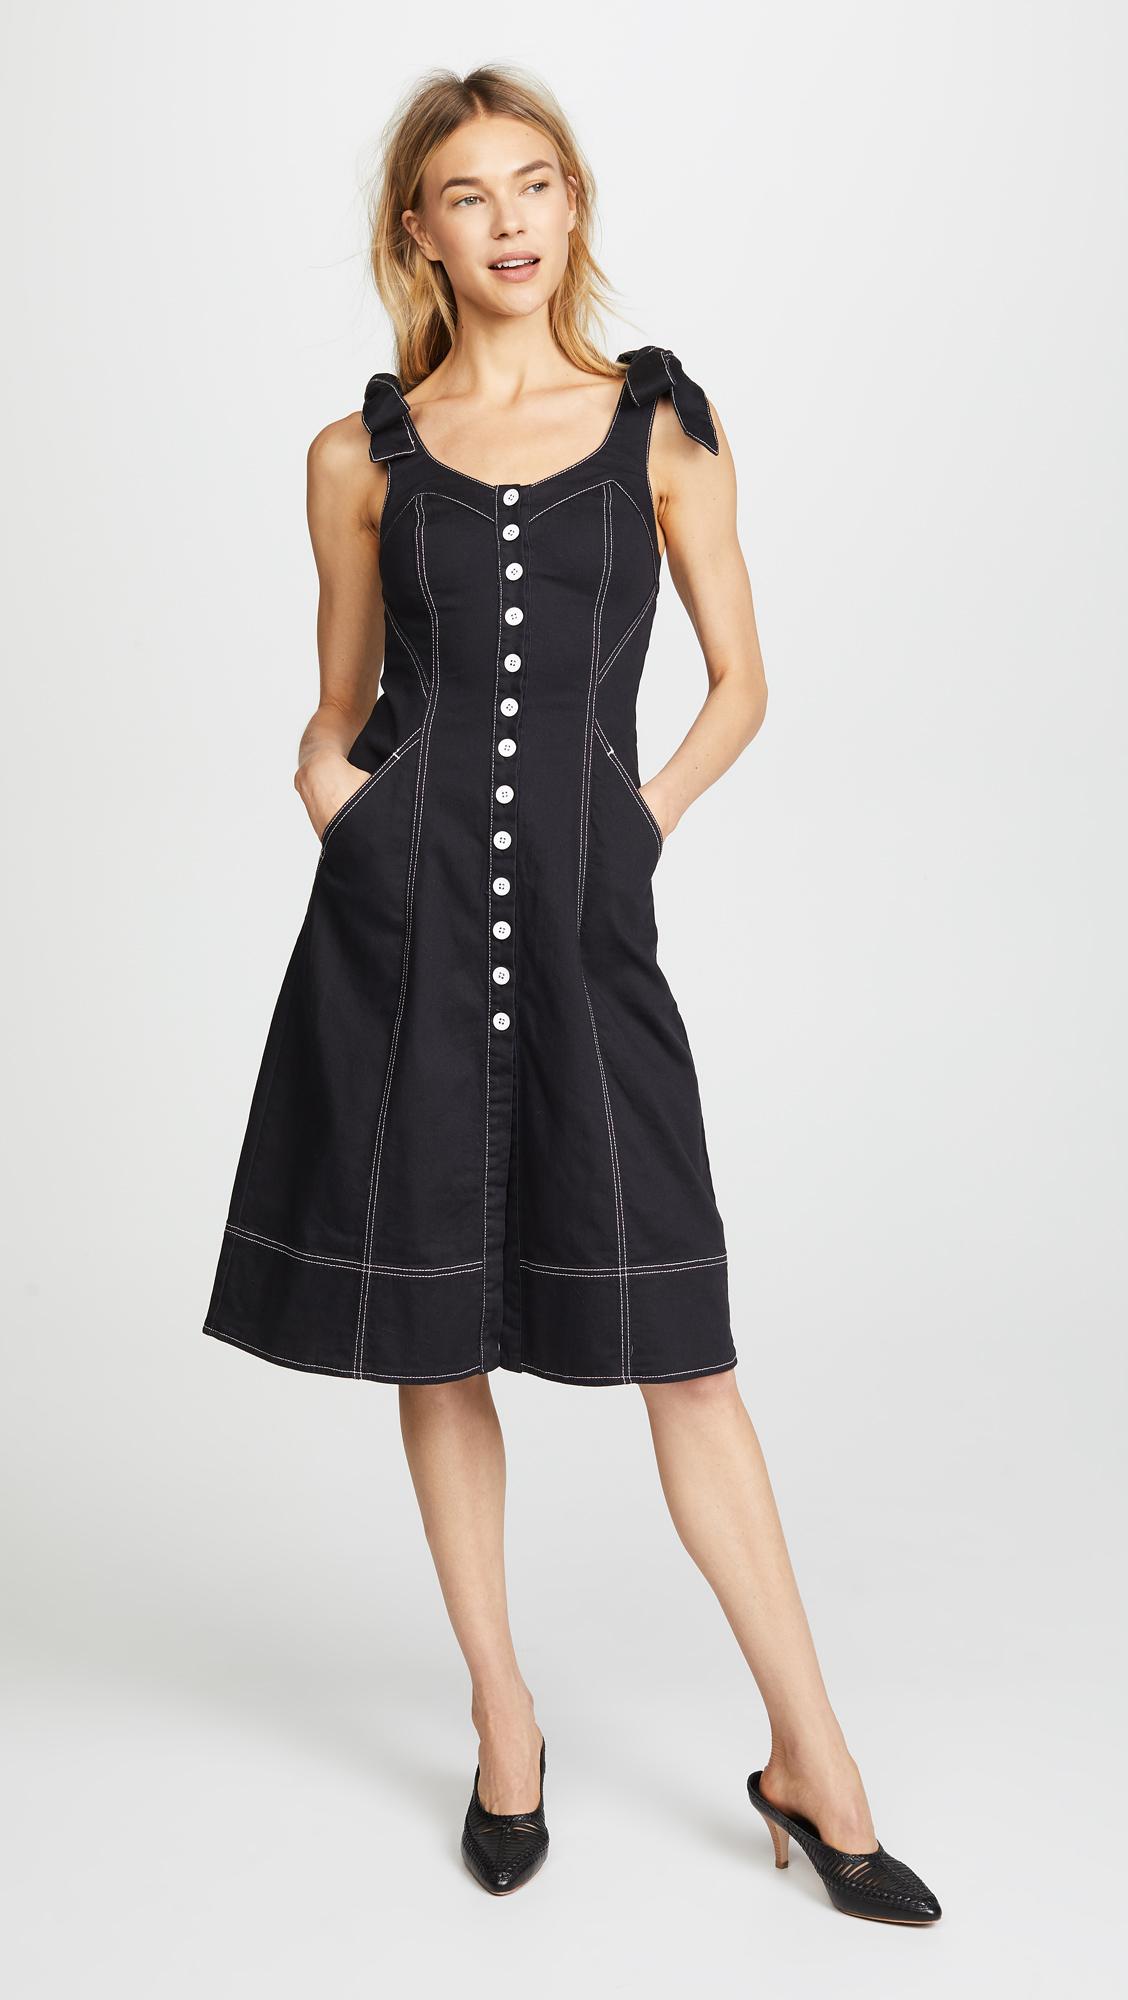 9388537f88f Ulla Johnson Emory Dress